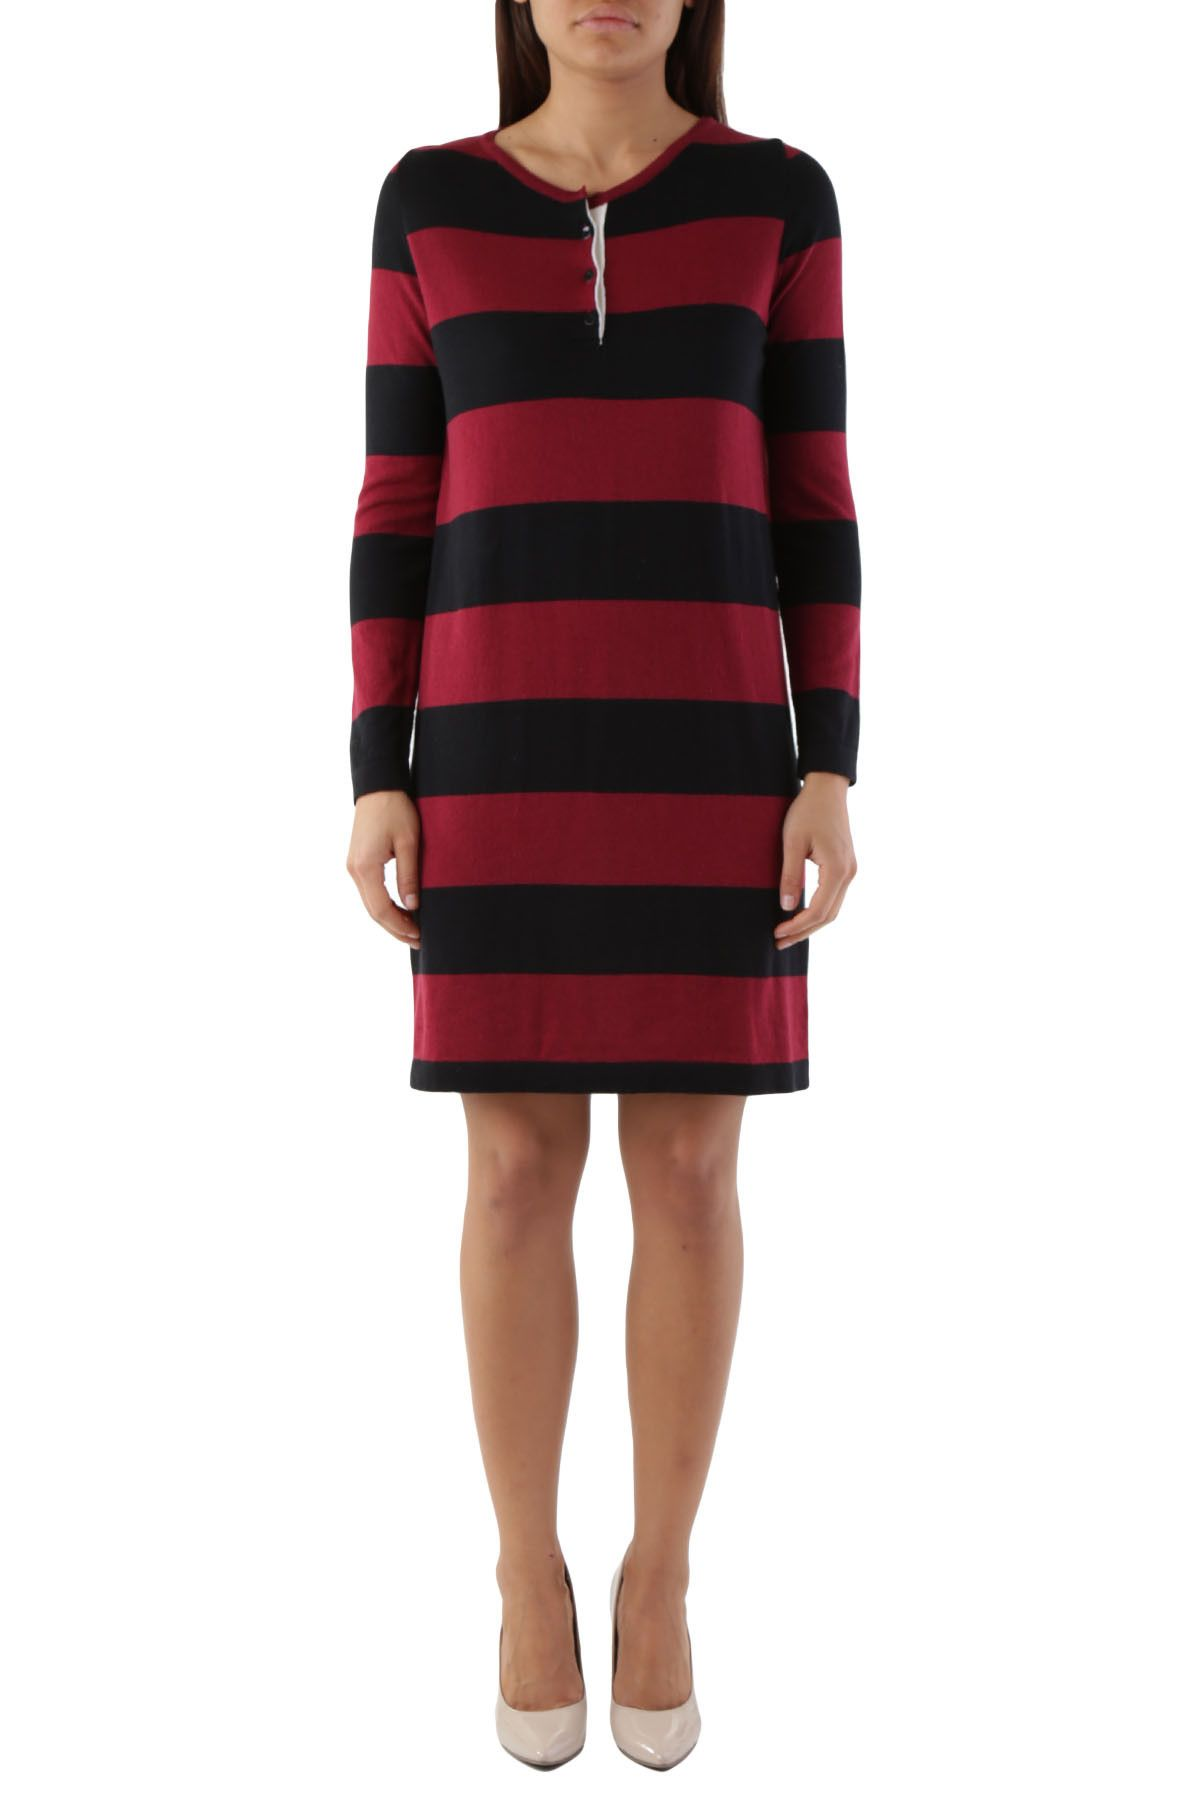 Olivia Hops Women's Dress In Red